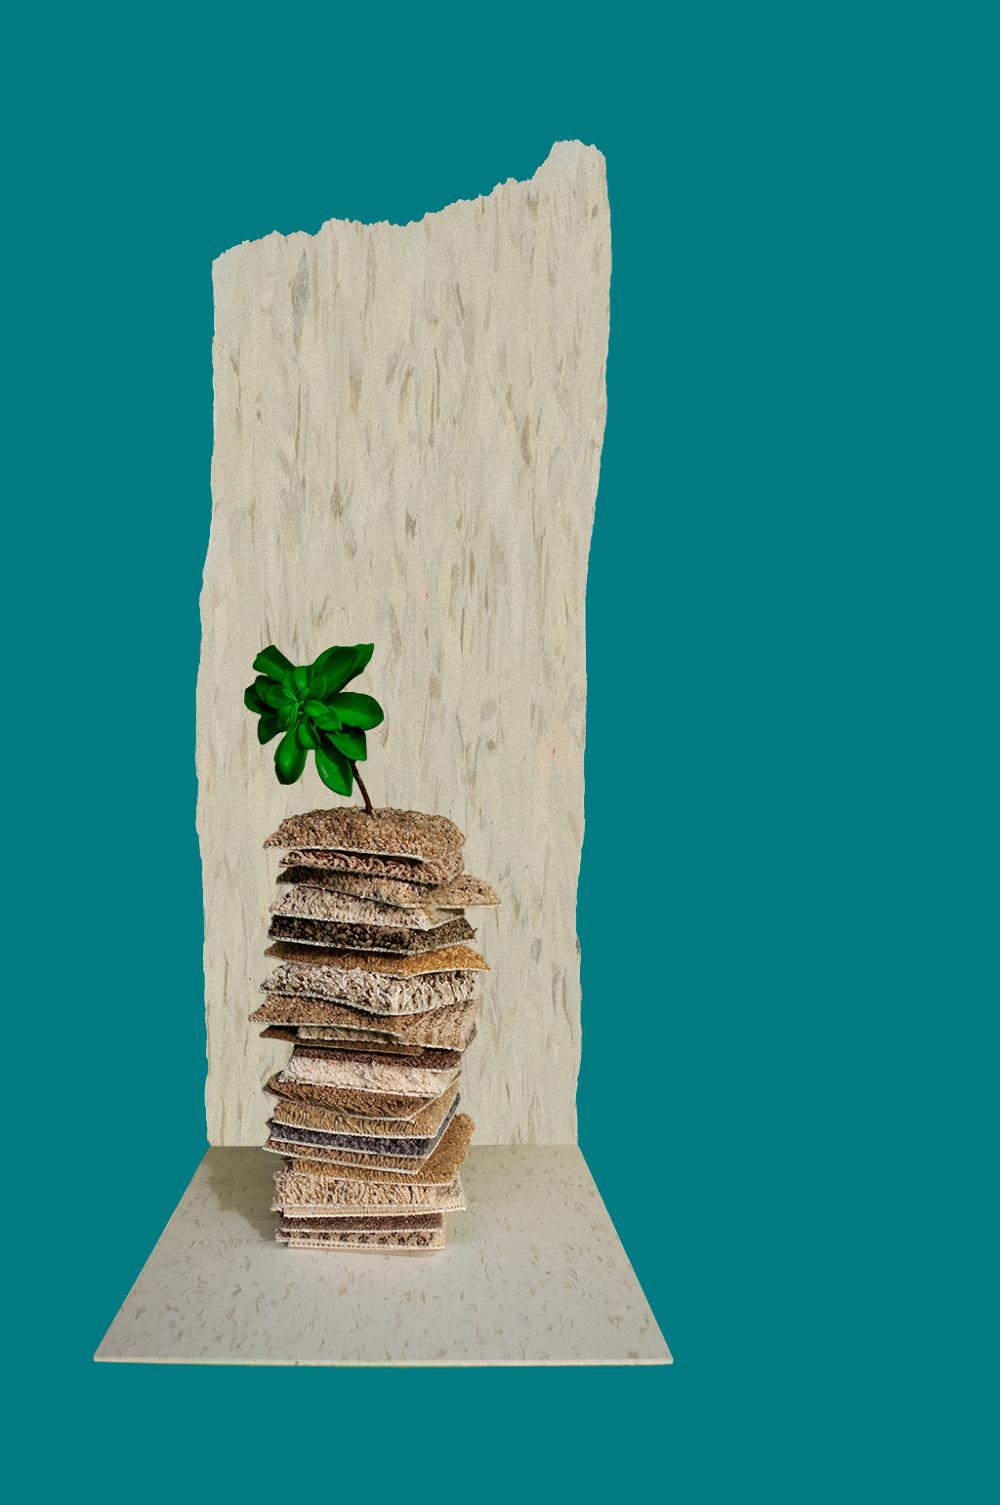 treecarpstack2_1000.jpg